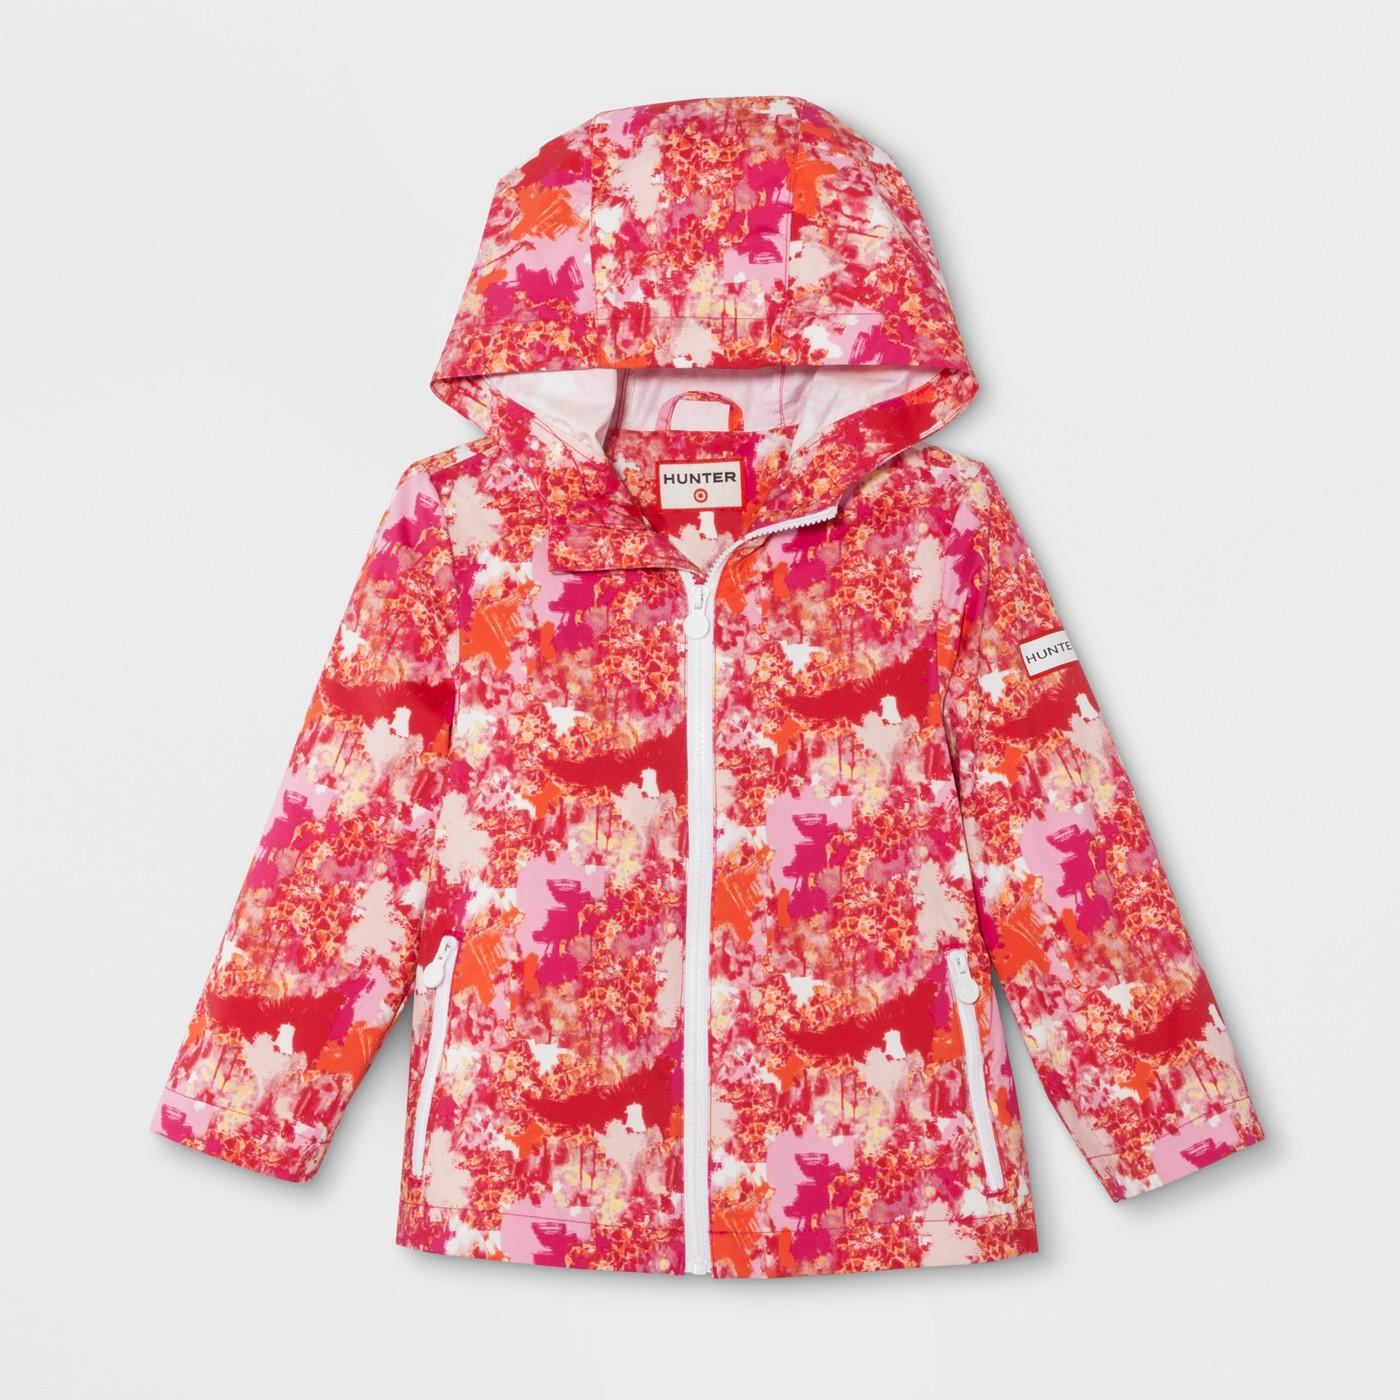 Hunter for Target Toddlers' Raincoat